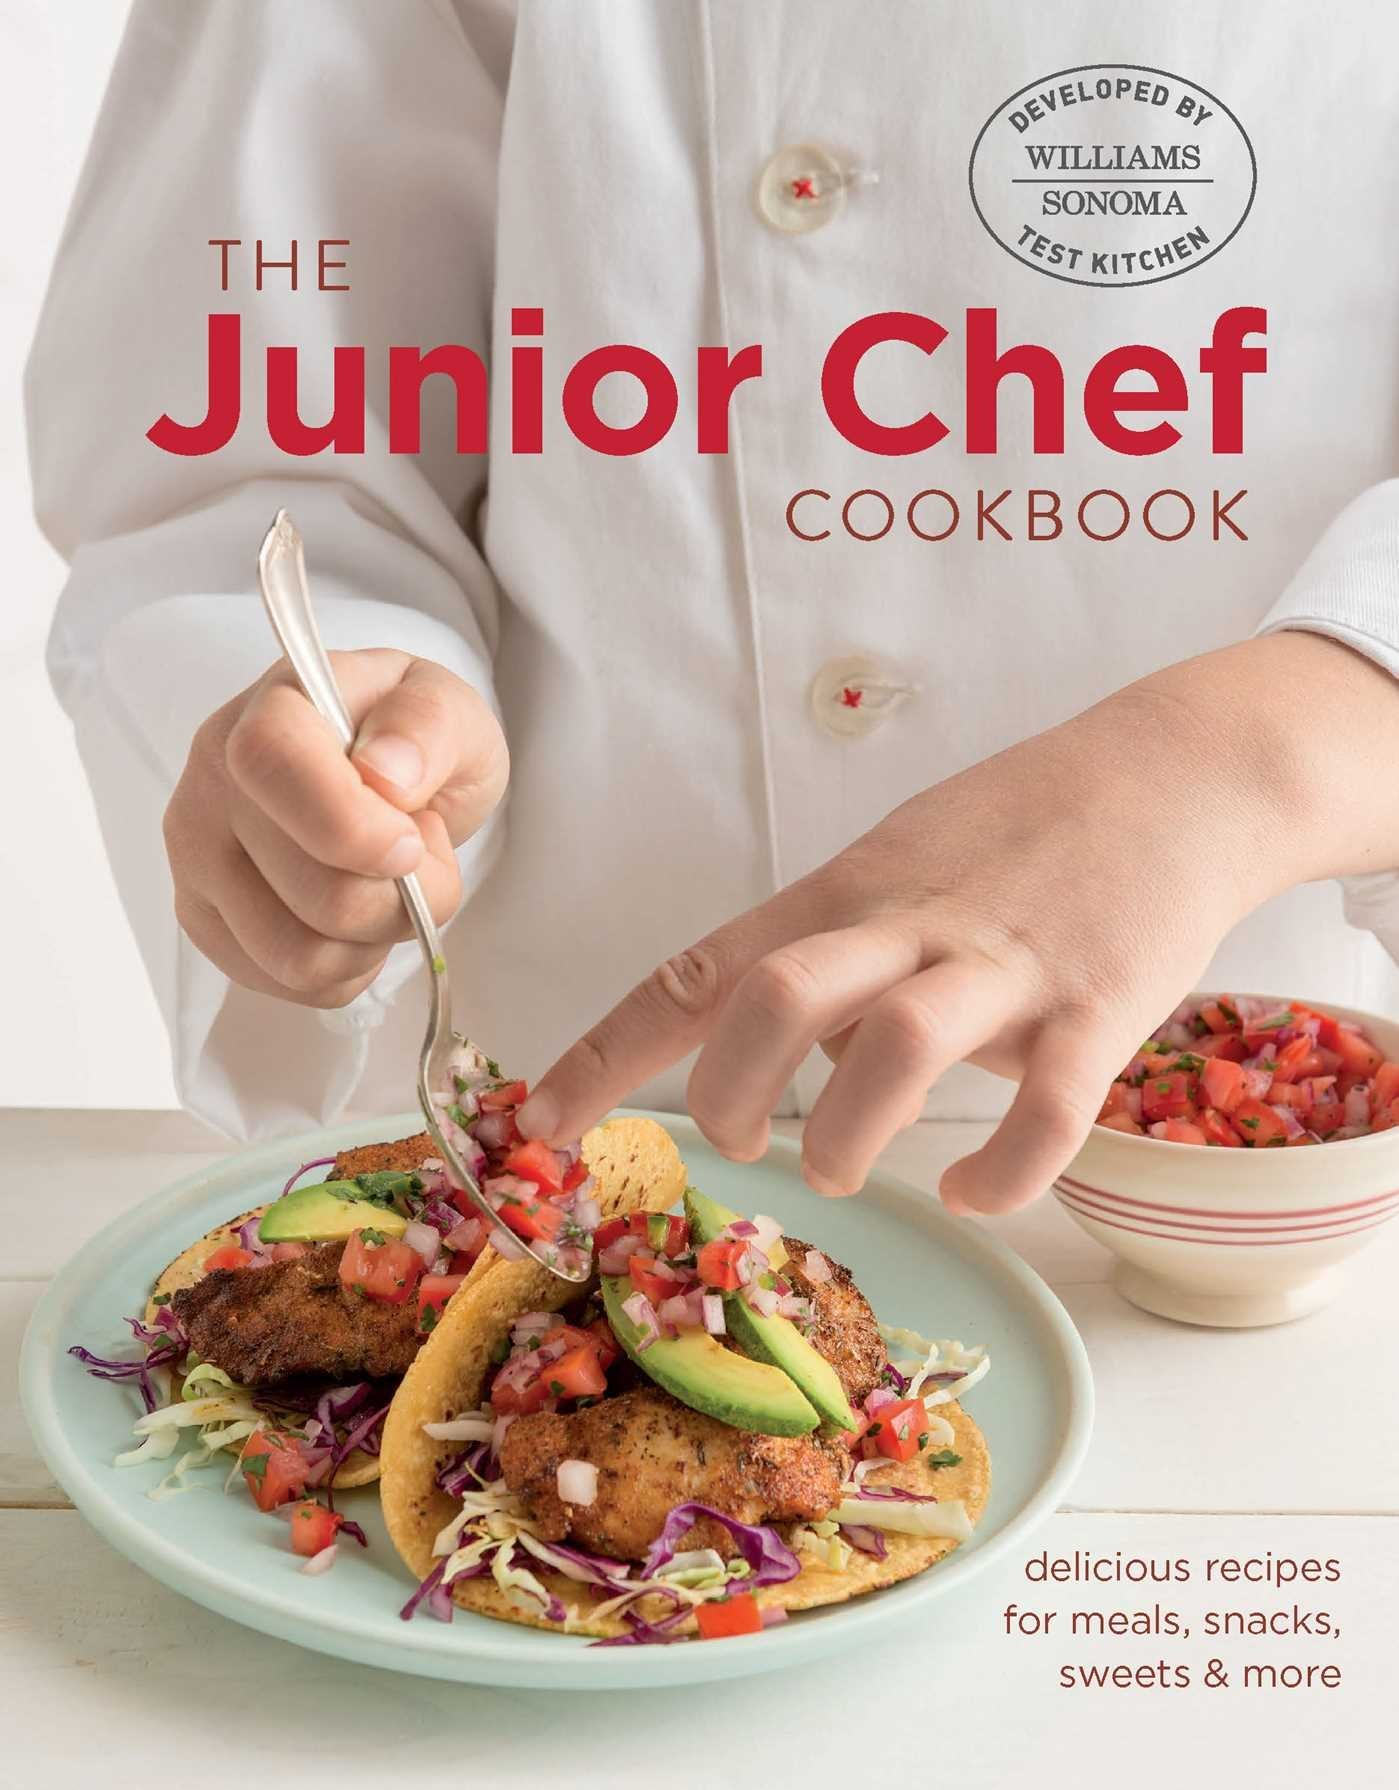 Amazon junior chef cookbook 9781681880242 williams sonoma amazon junior chef cookbook 9781681880242 williams sonoma test kitchen books forumfinder Choice Image